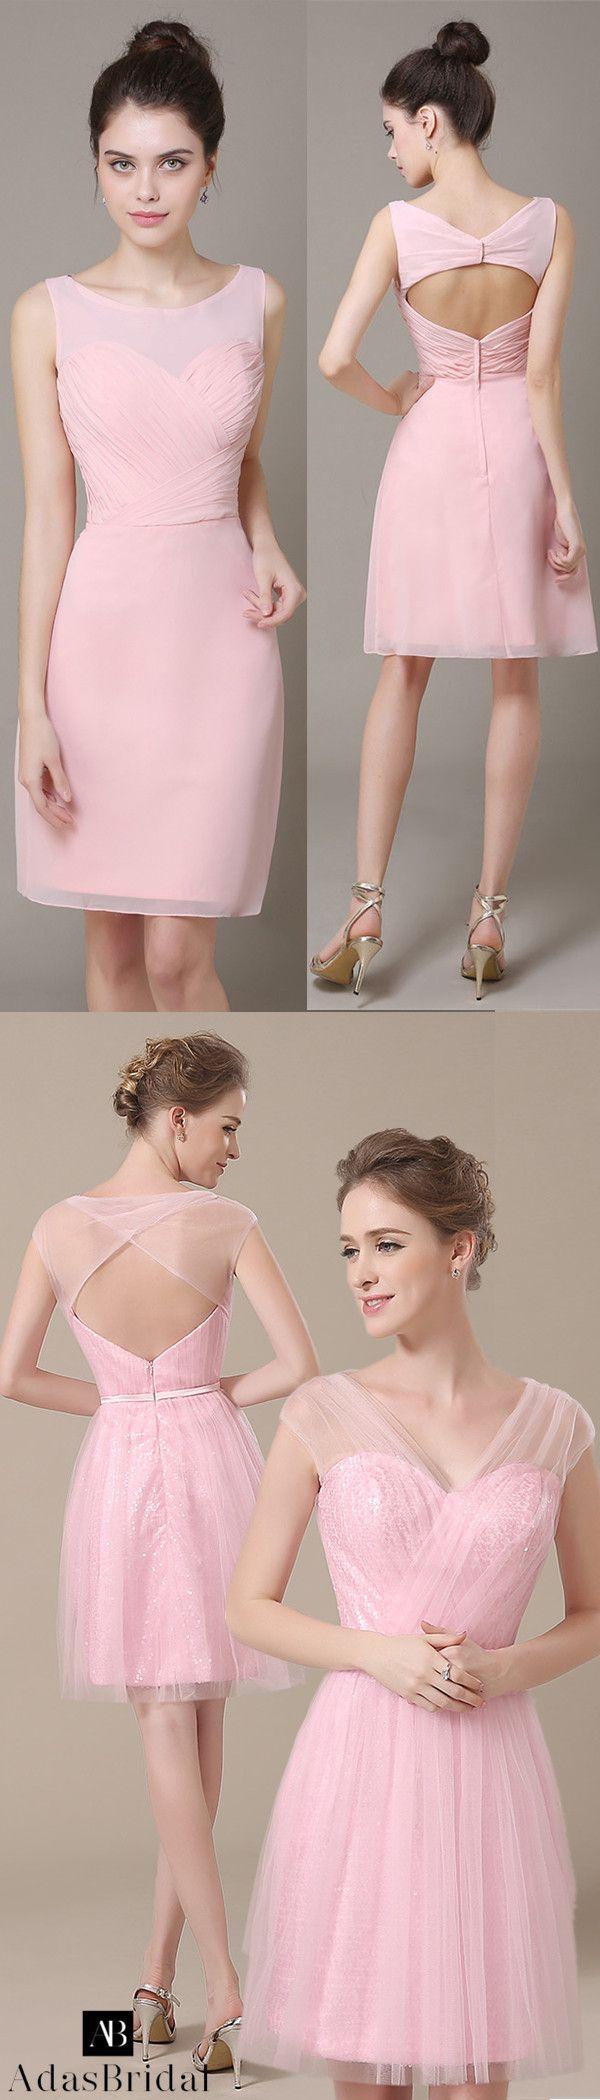 767 best Wedding and Evening images on Pinterest | Bride dresses ...